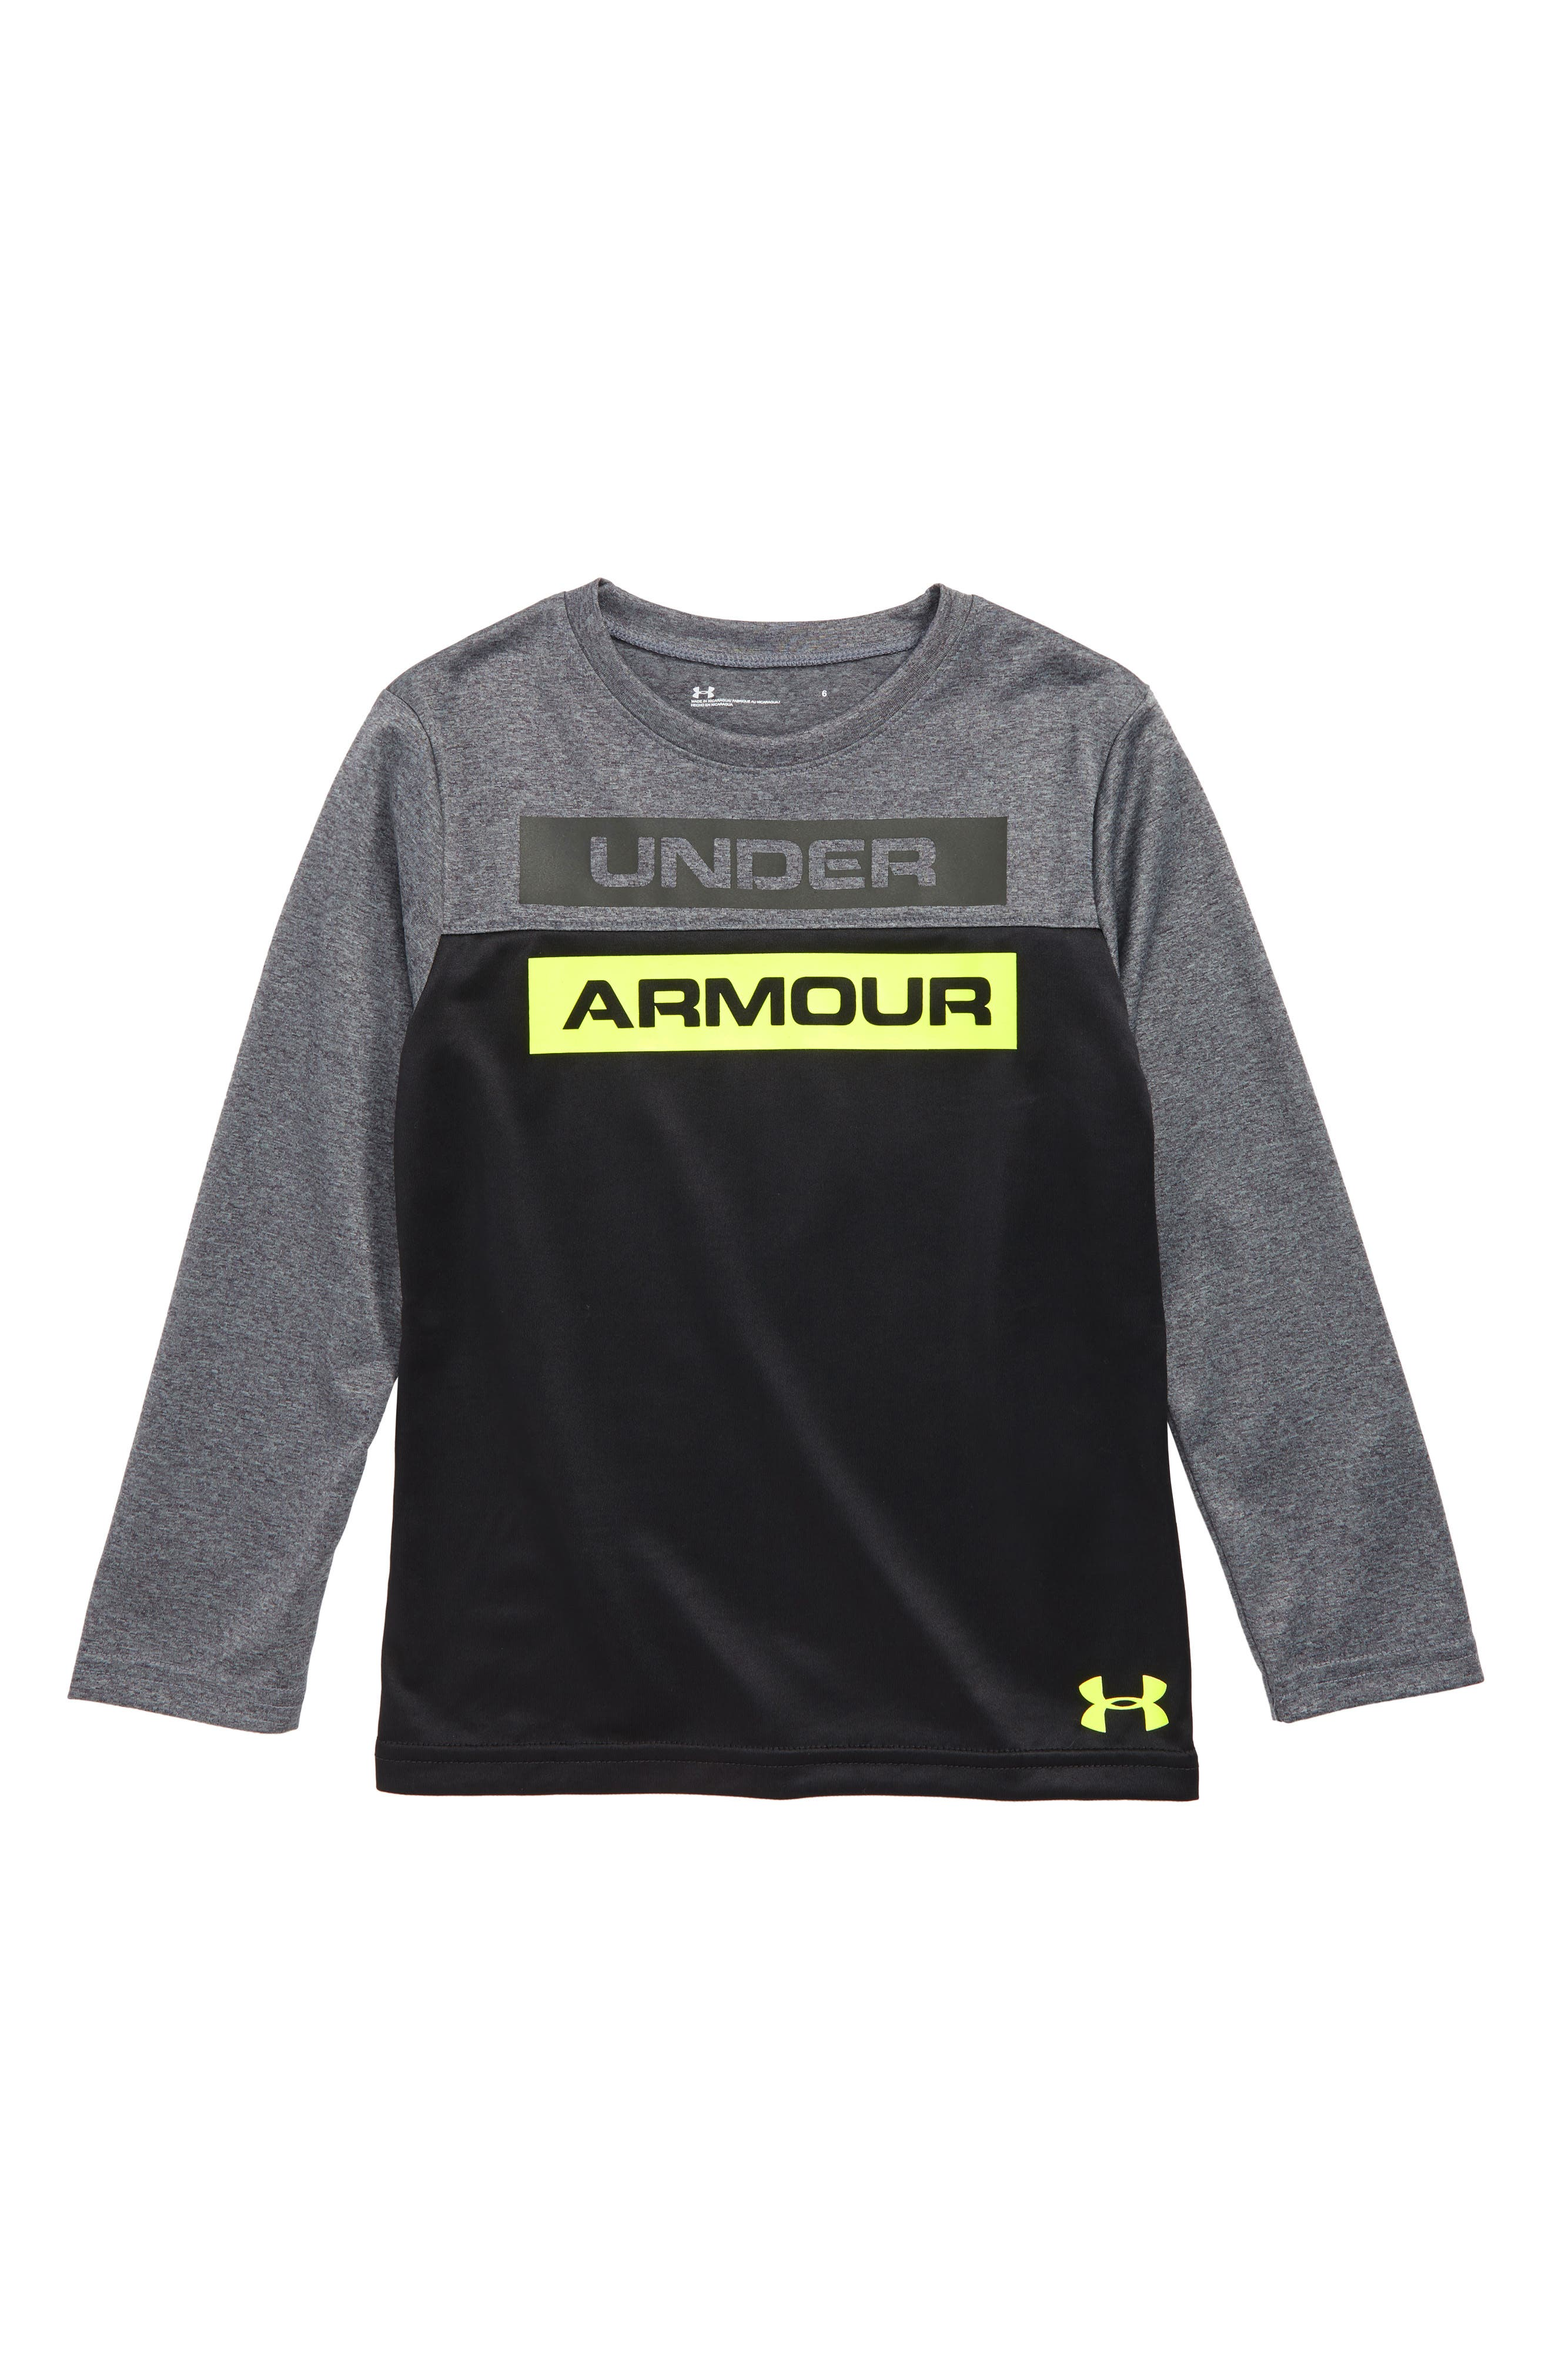 Boys Under Armour Blocked Wordmark Graphic TShirt Size 7  Grey